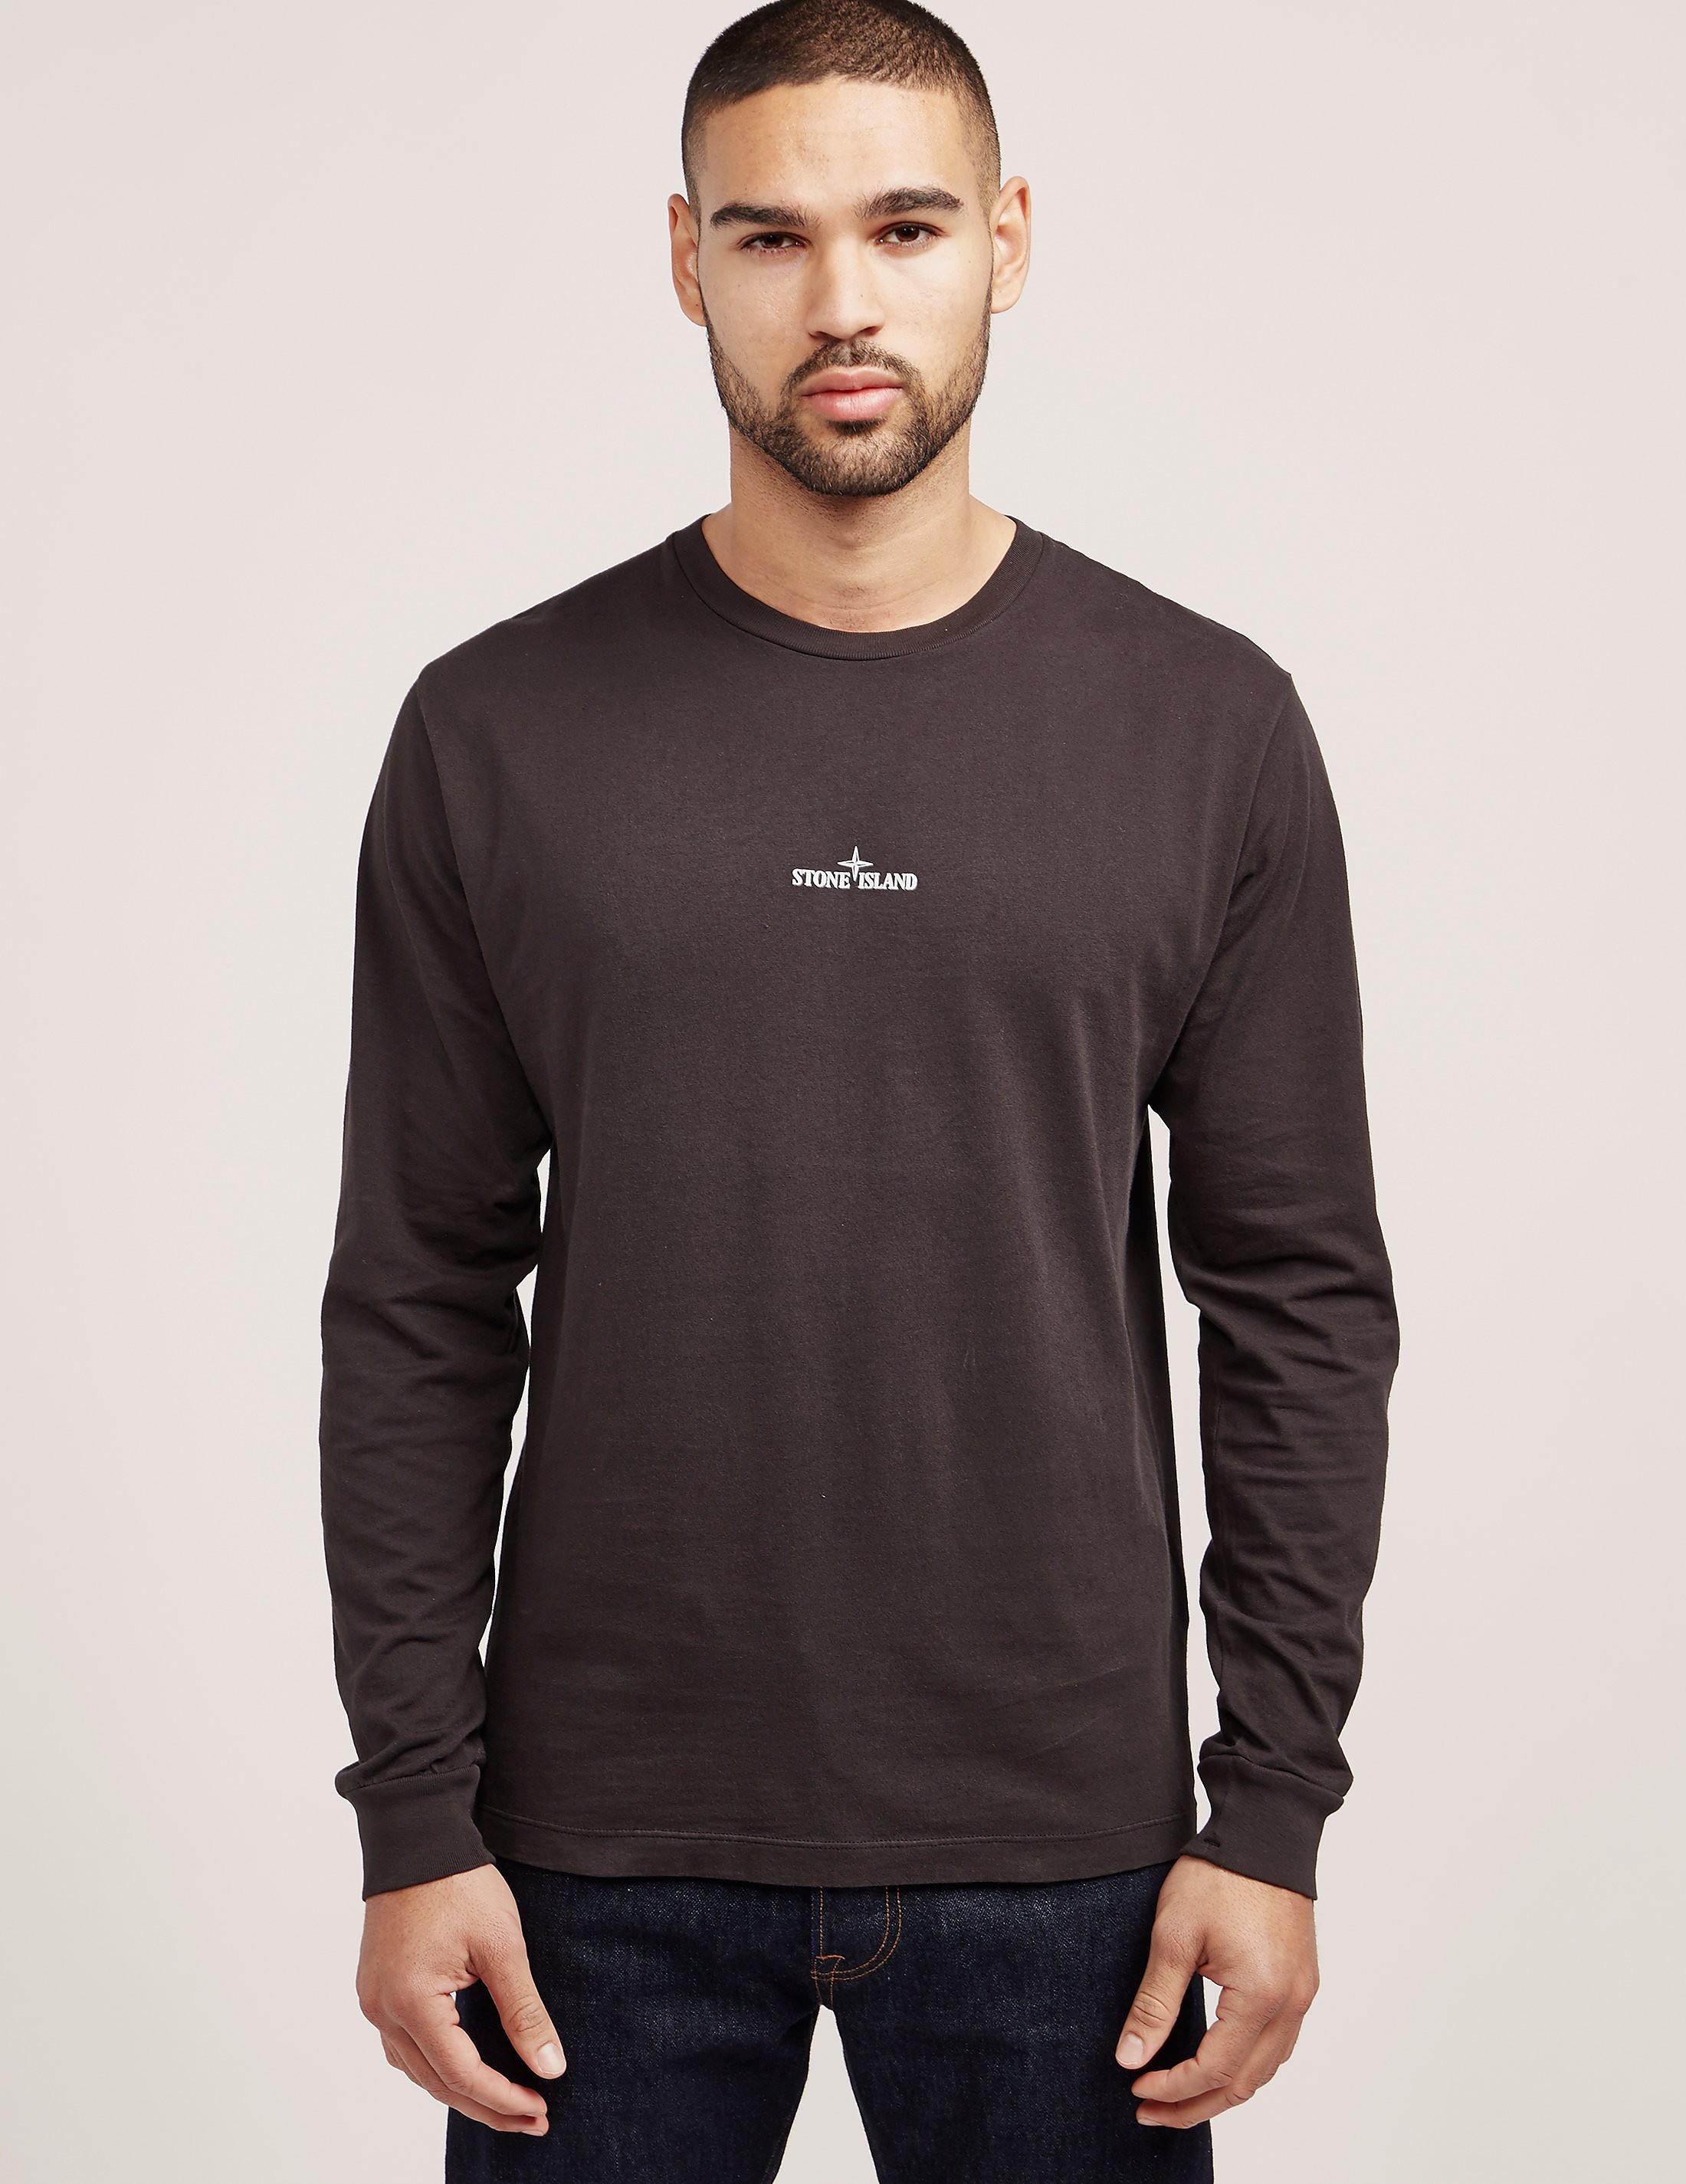 Stone Island Back Pin Long Sleeve T-Shirt